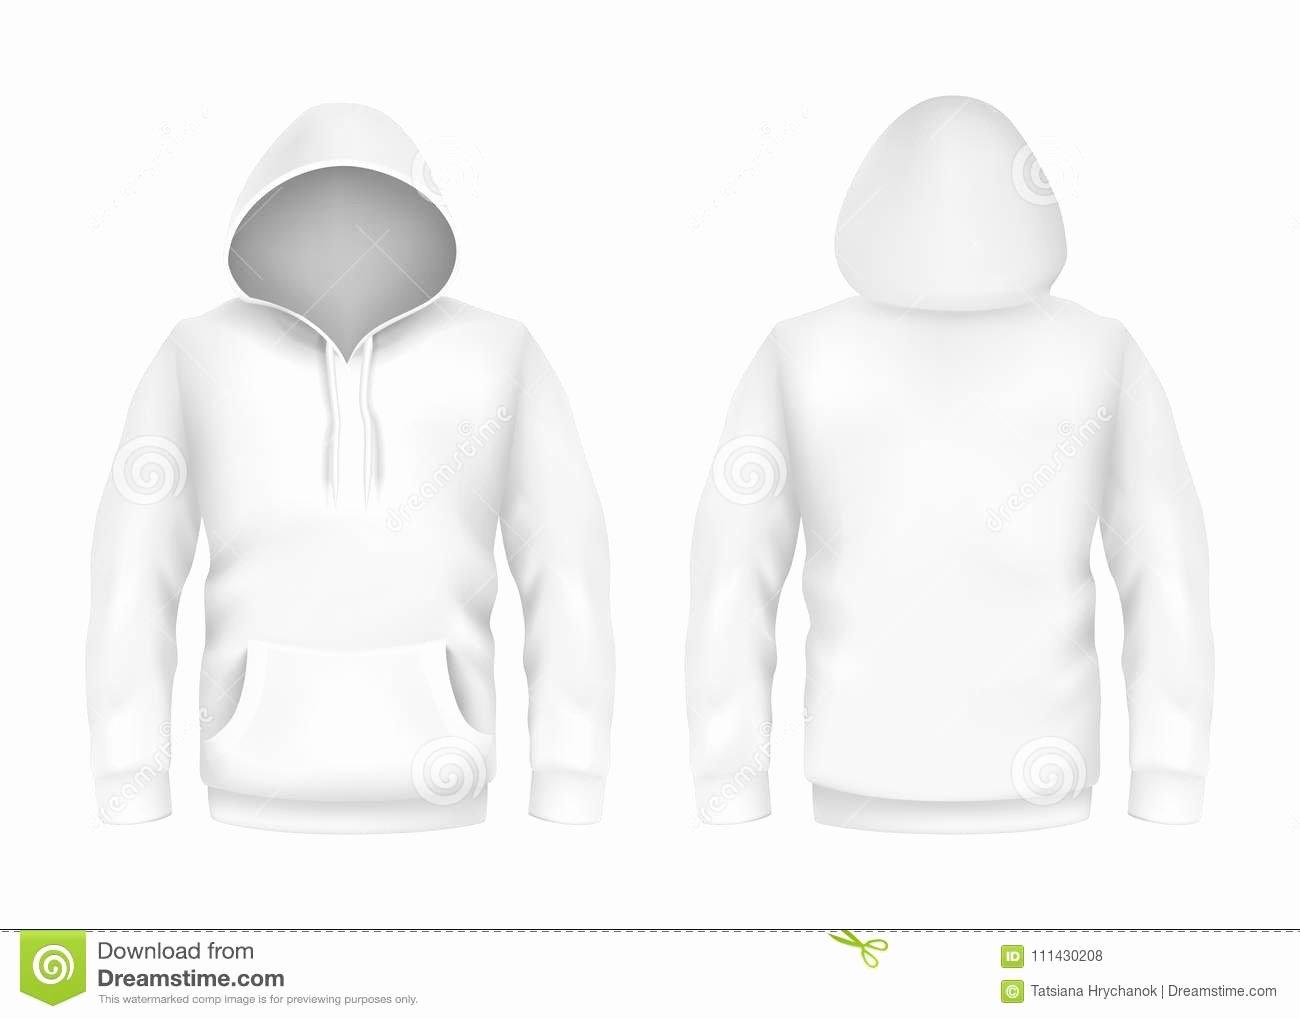 Hooded Sweatshirt Template New Sweatshirt Cartoons Illustrations & Vector Stock